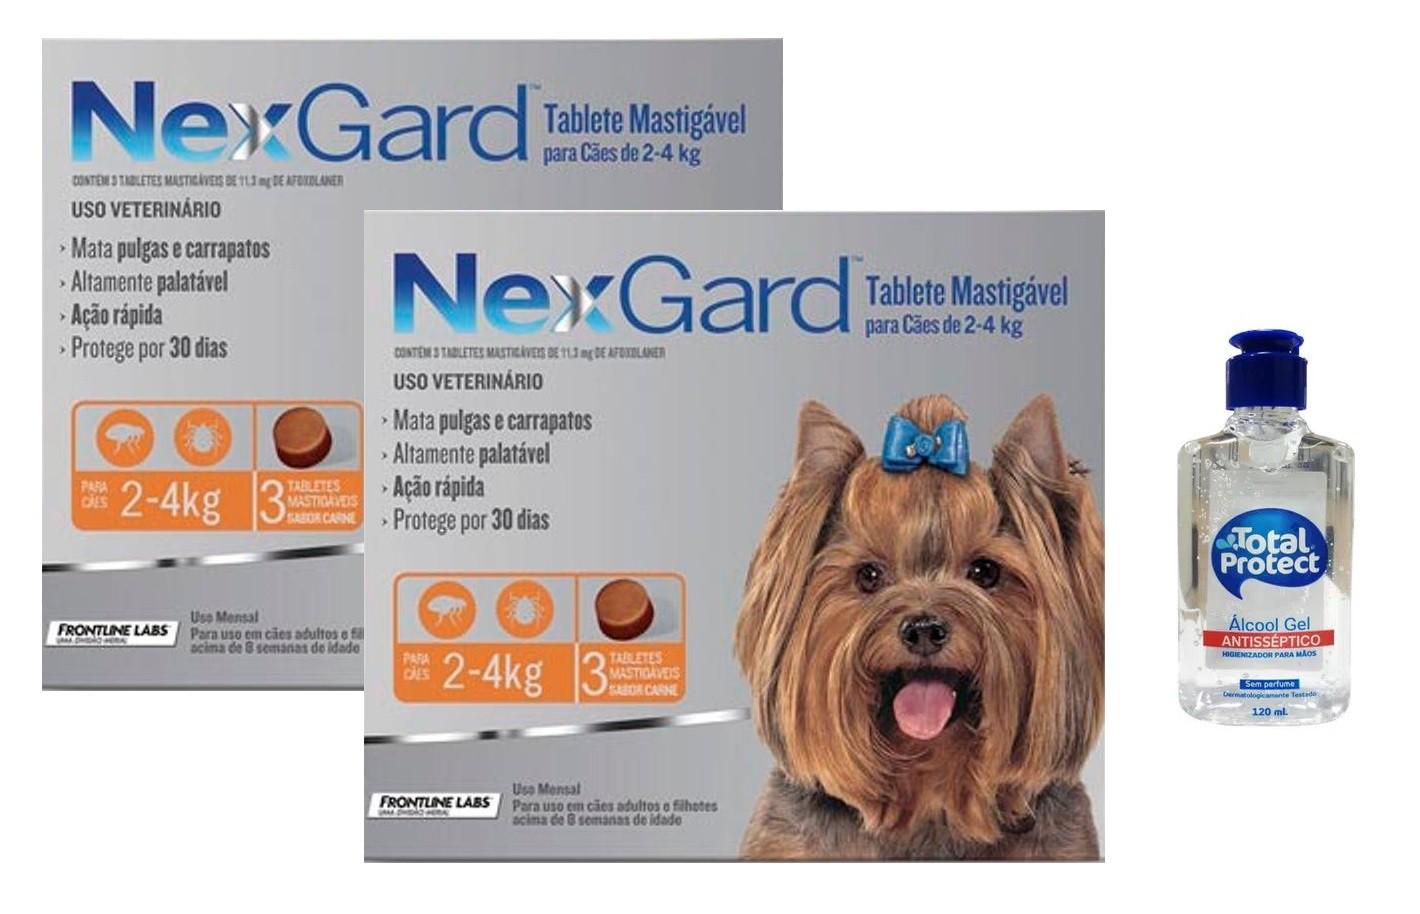 Kit 2 Unidades Antipulgas e Carrapatos Nexgard 11,3mg para Cães de 2 a 4kg (3 tabletes) - Merial + Brinde Álcool Gel 120ml Total Protect